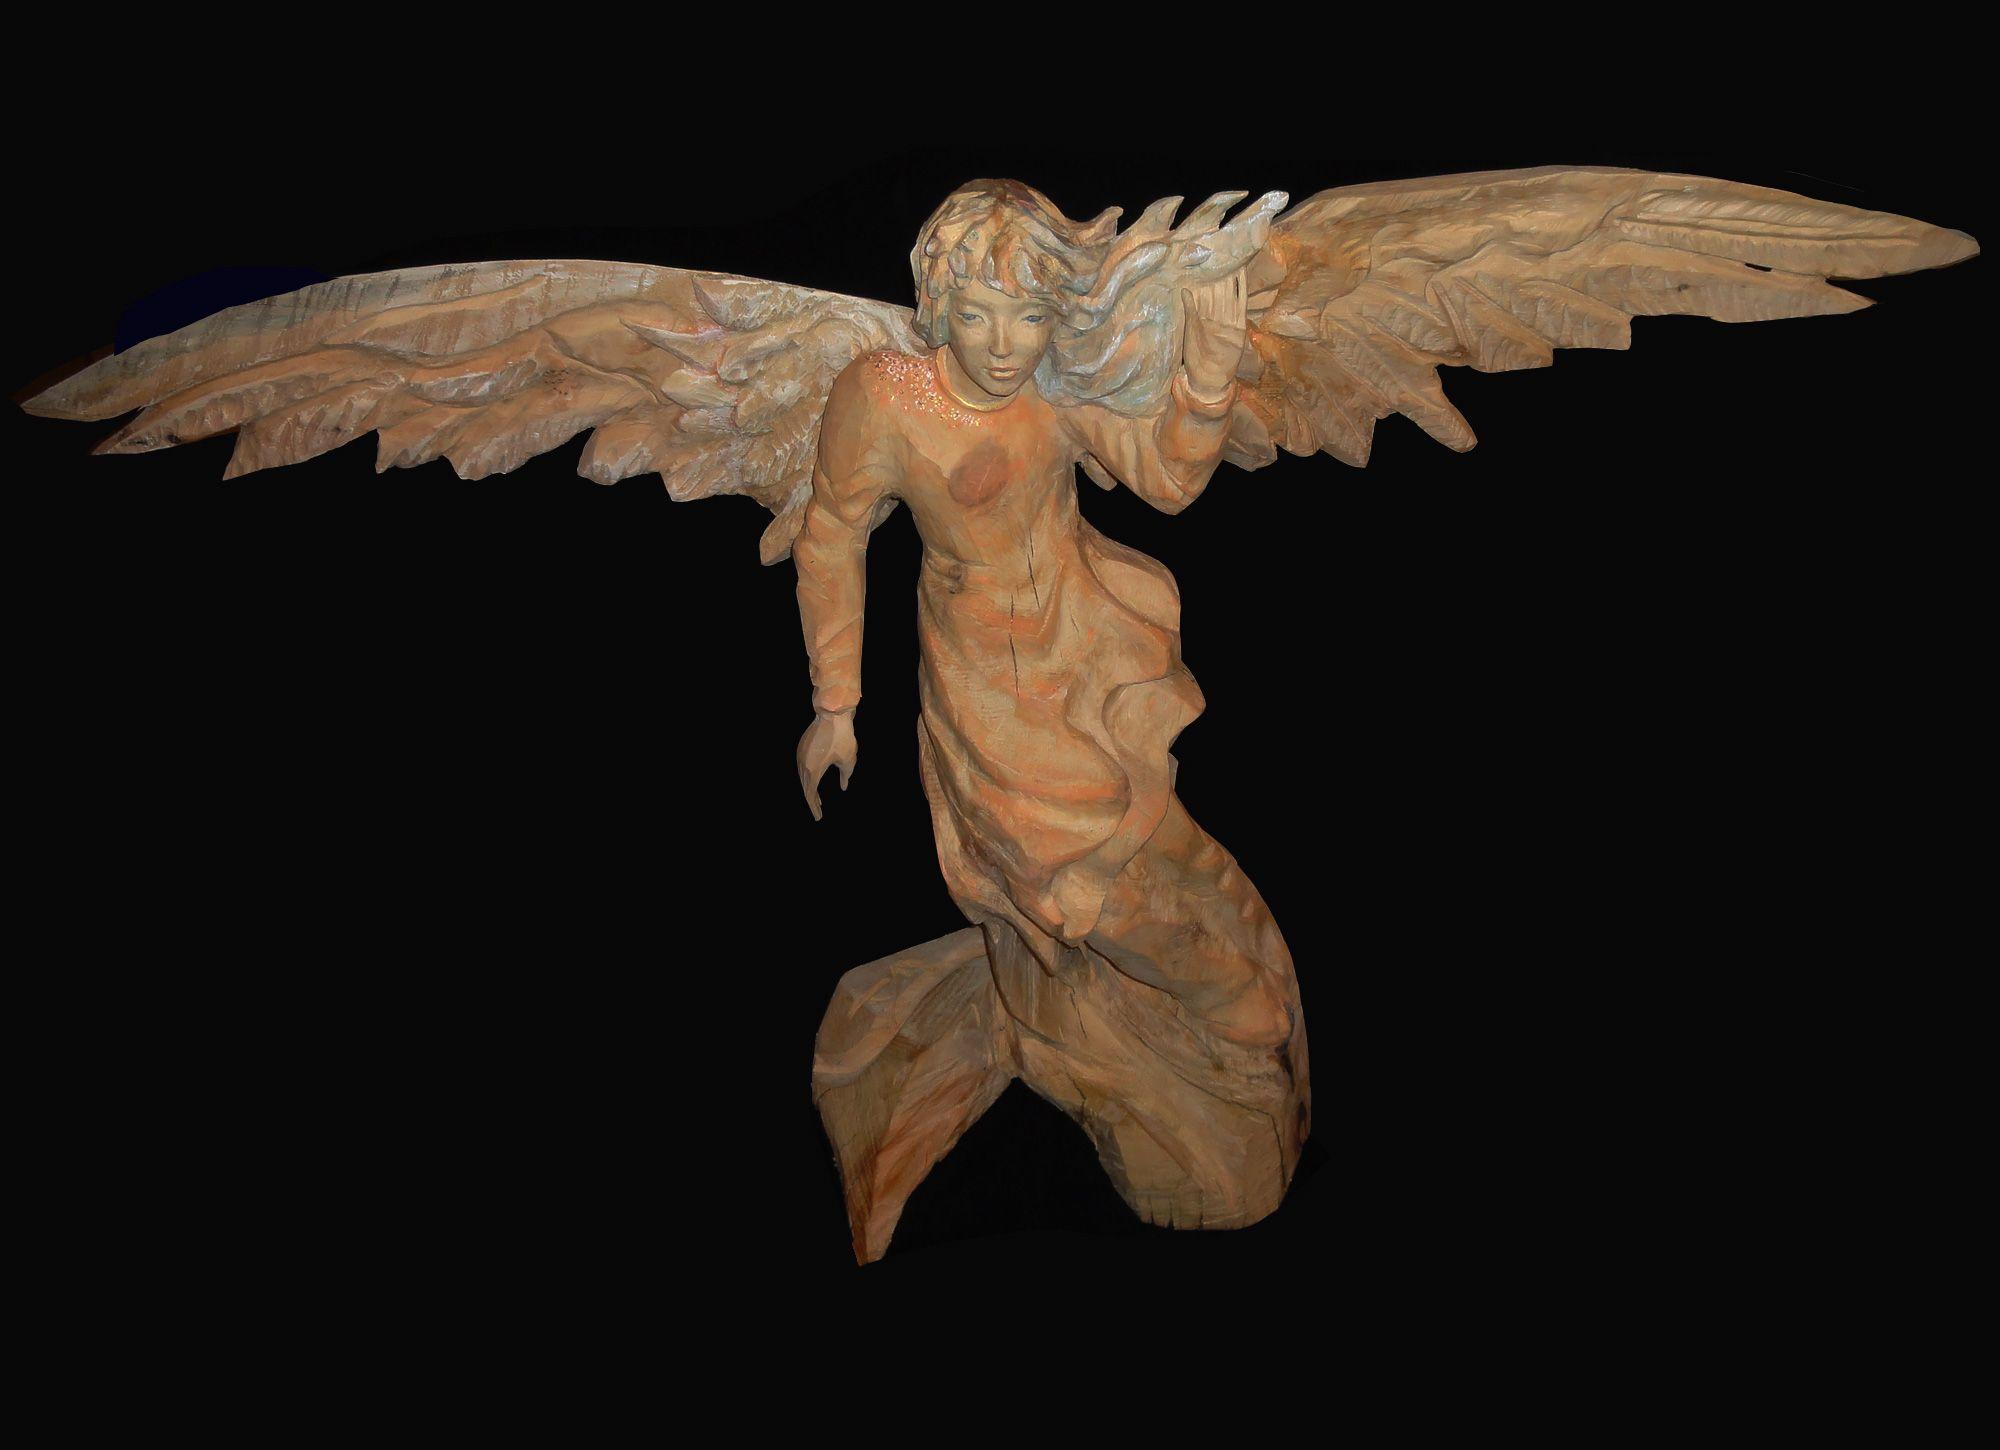 Himmelsbote #engel #angel #angelo #zirbe #chainsawcarving